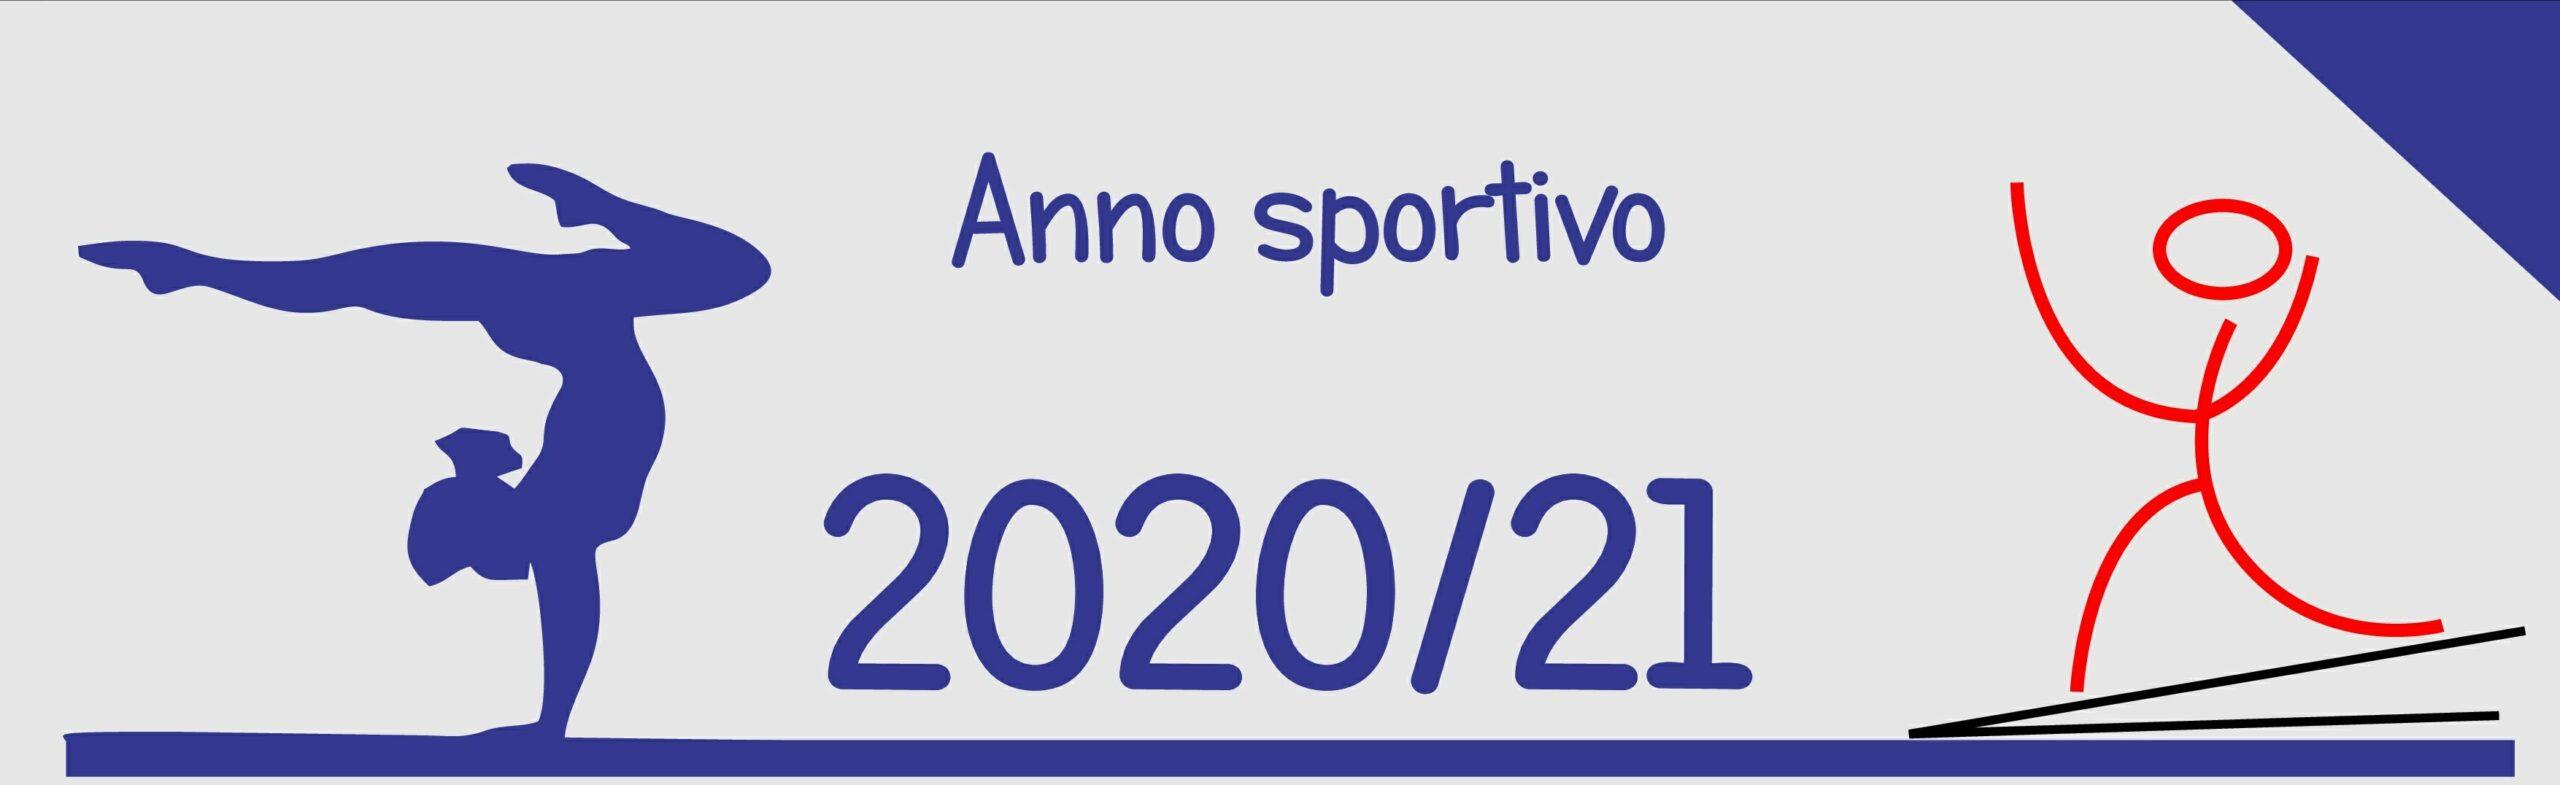 Ginnastica Artistica 2020/2021